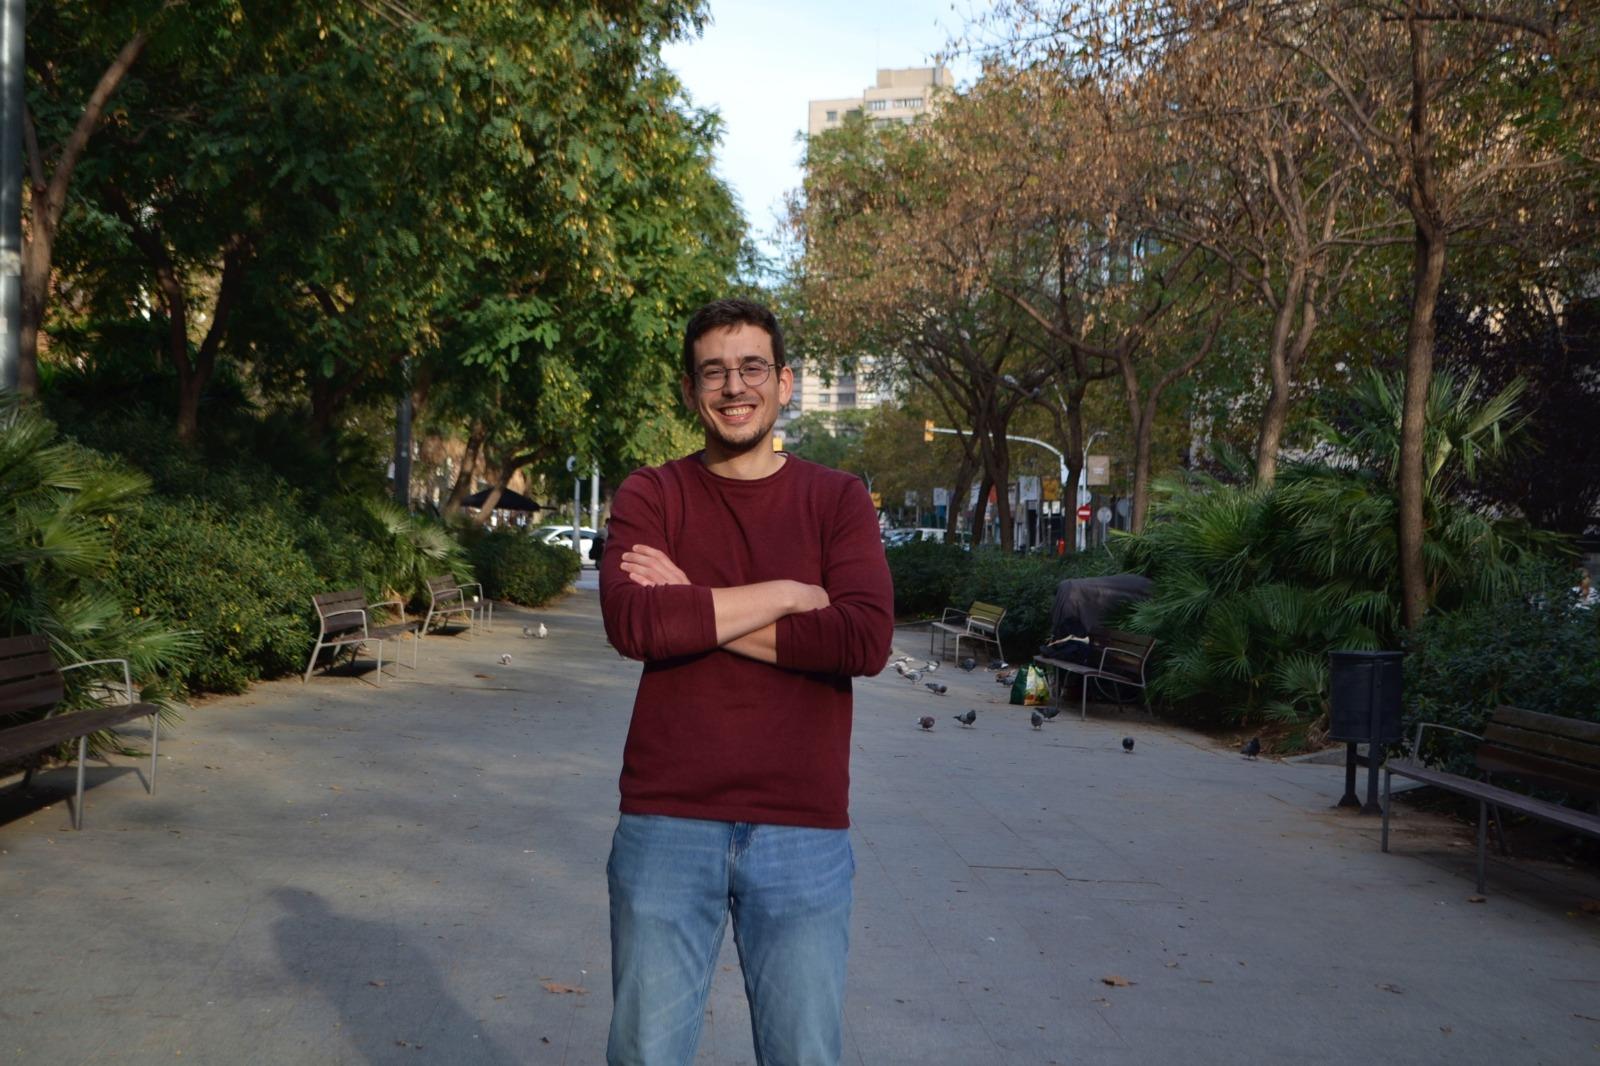 Oriol Casanellas, candidat del Jovent Republicà Penedès-Anoia